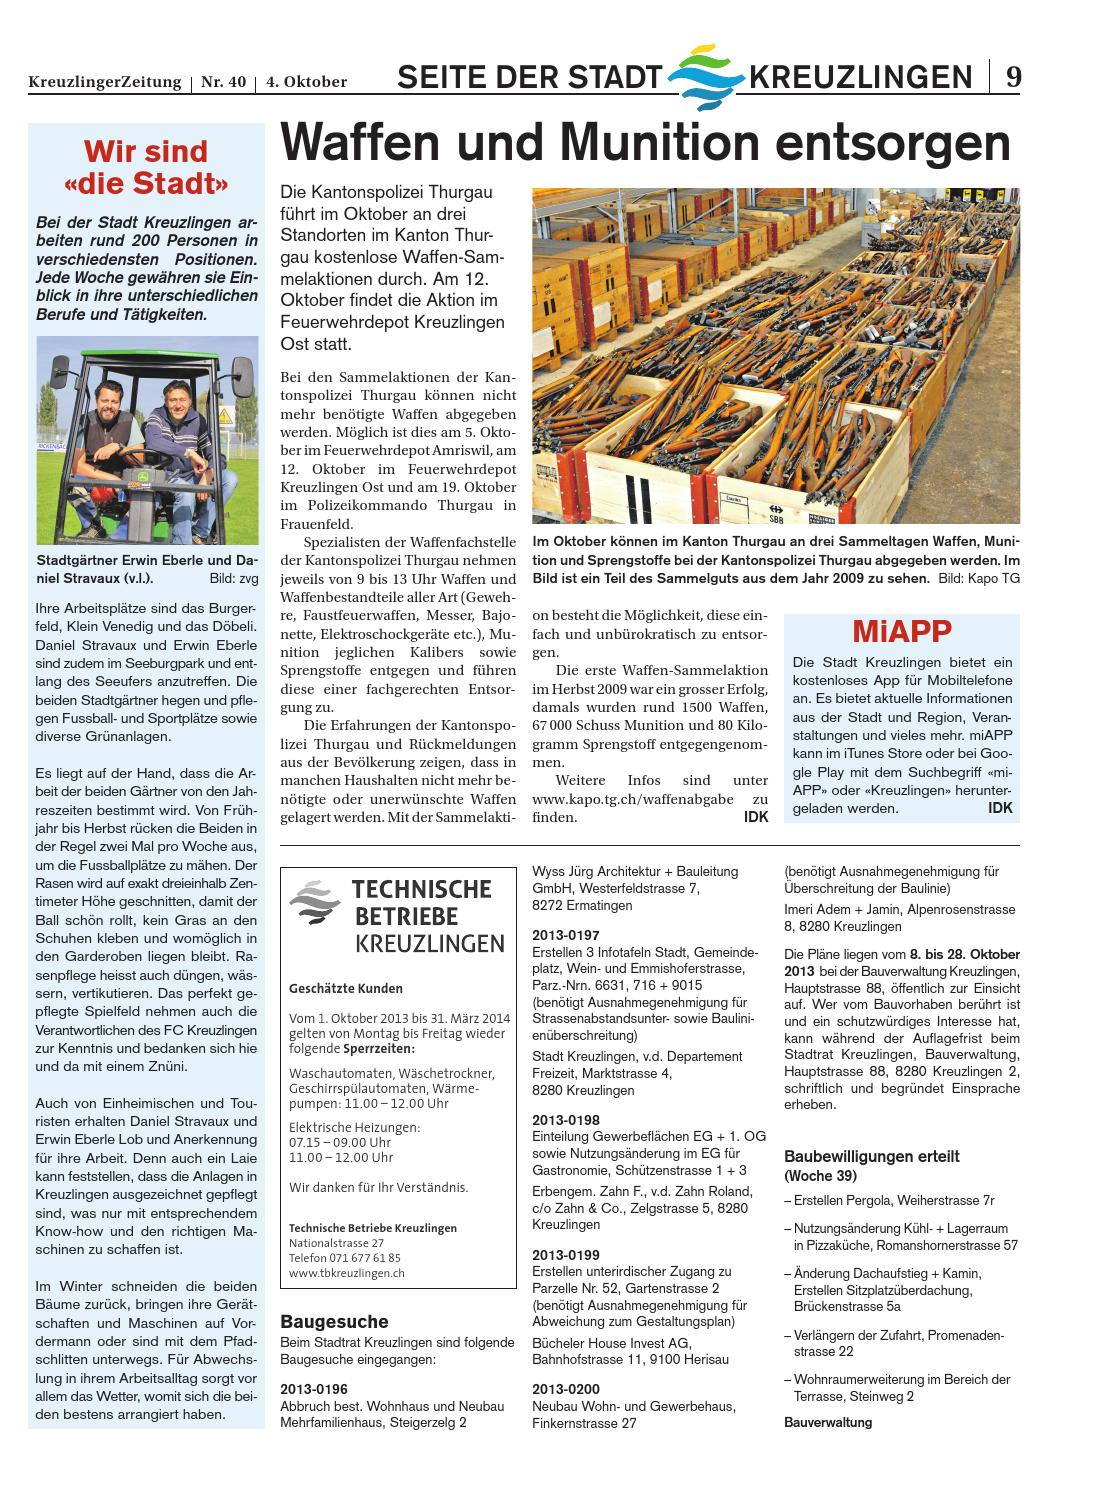 Klz 40 By Kreuzlingerzeitung Issuu